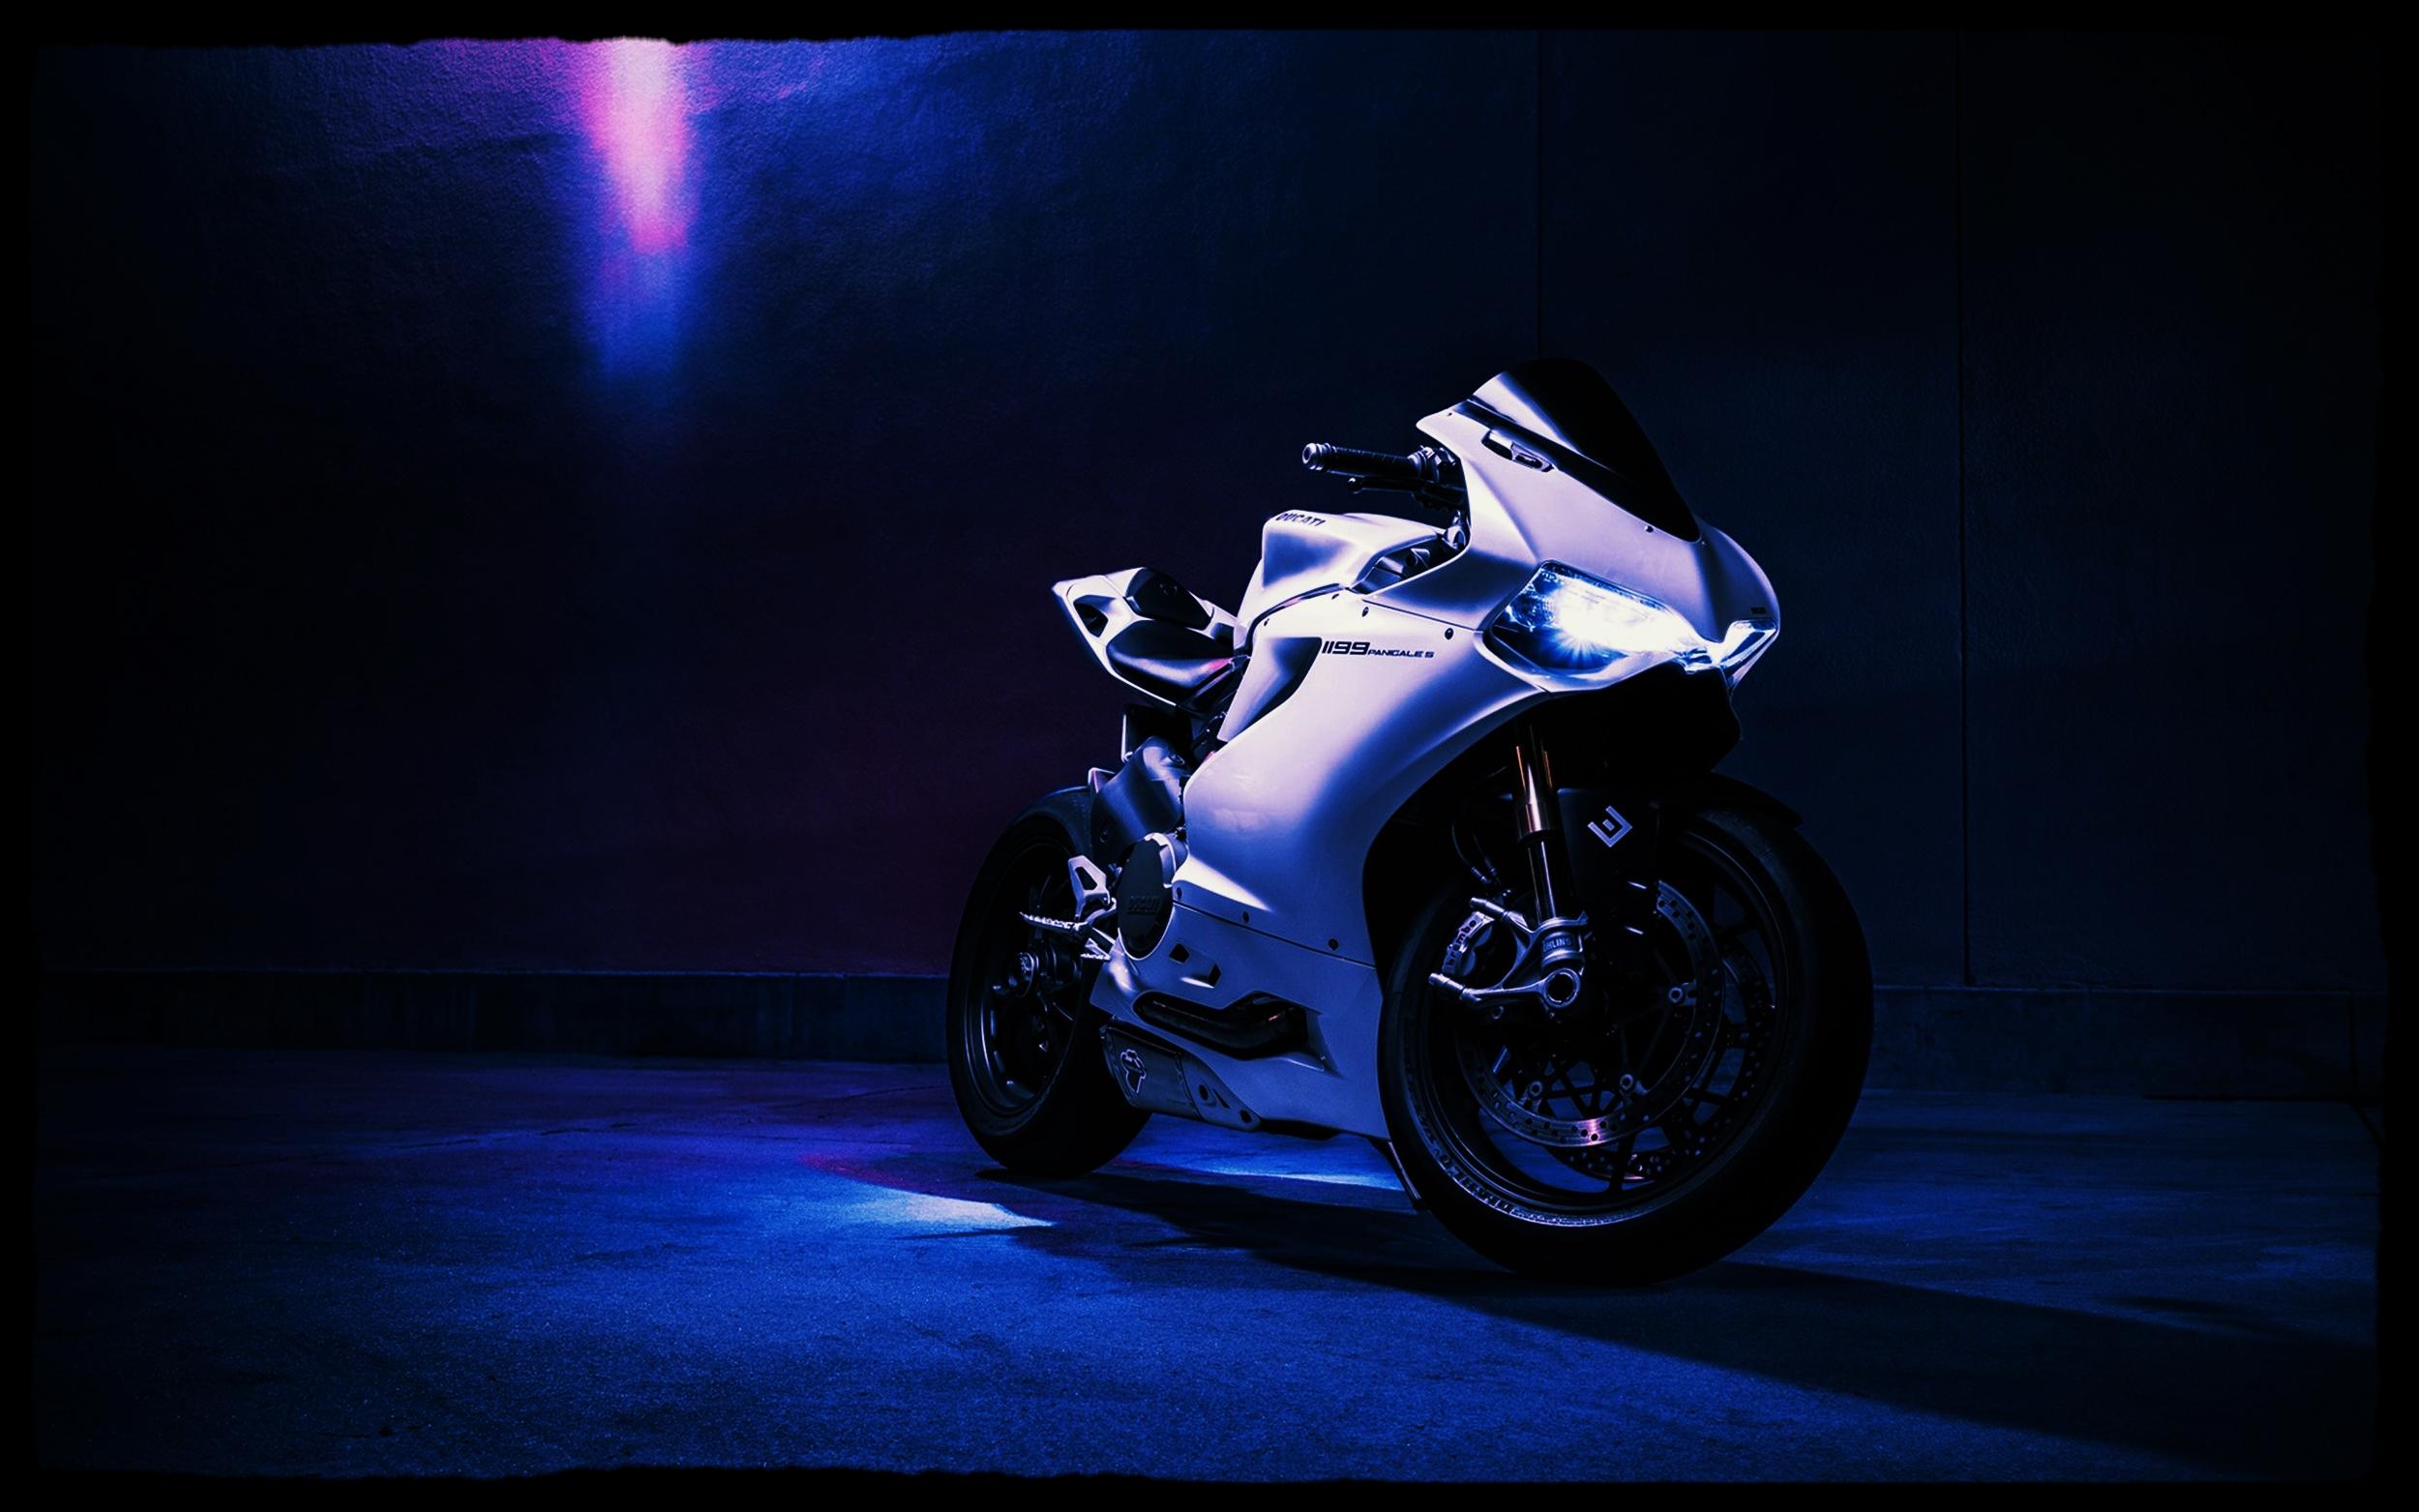 white-Ducati-Panigale-1199-1.jpg